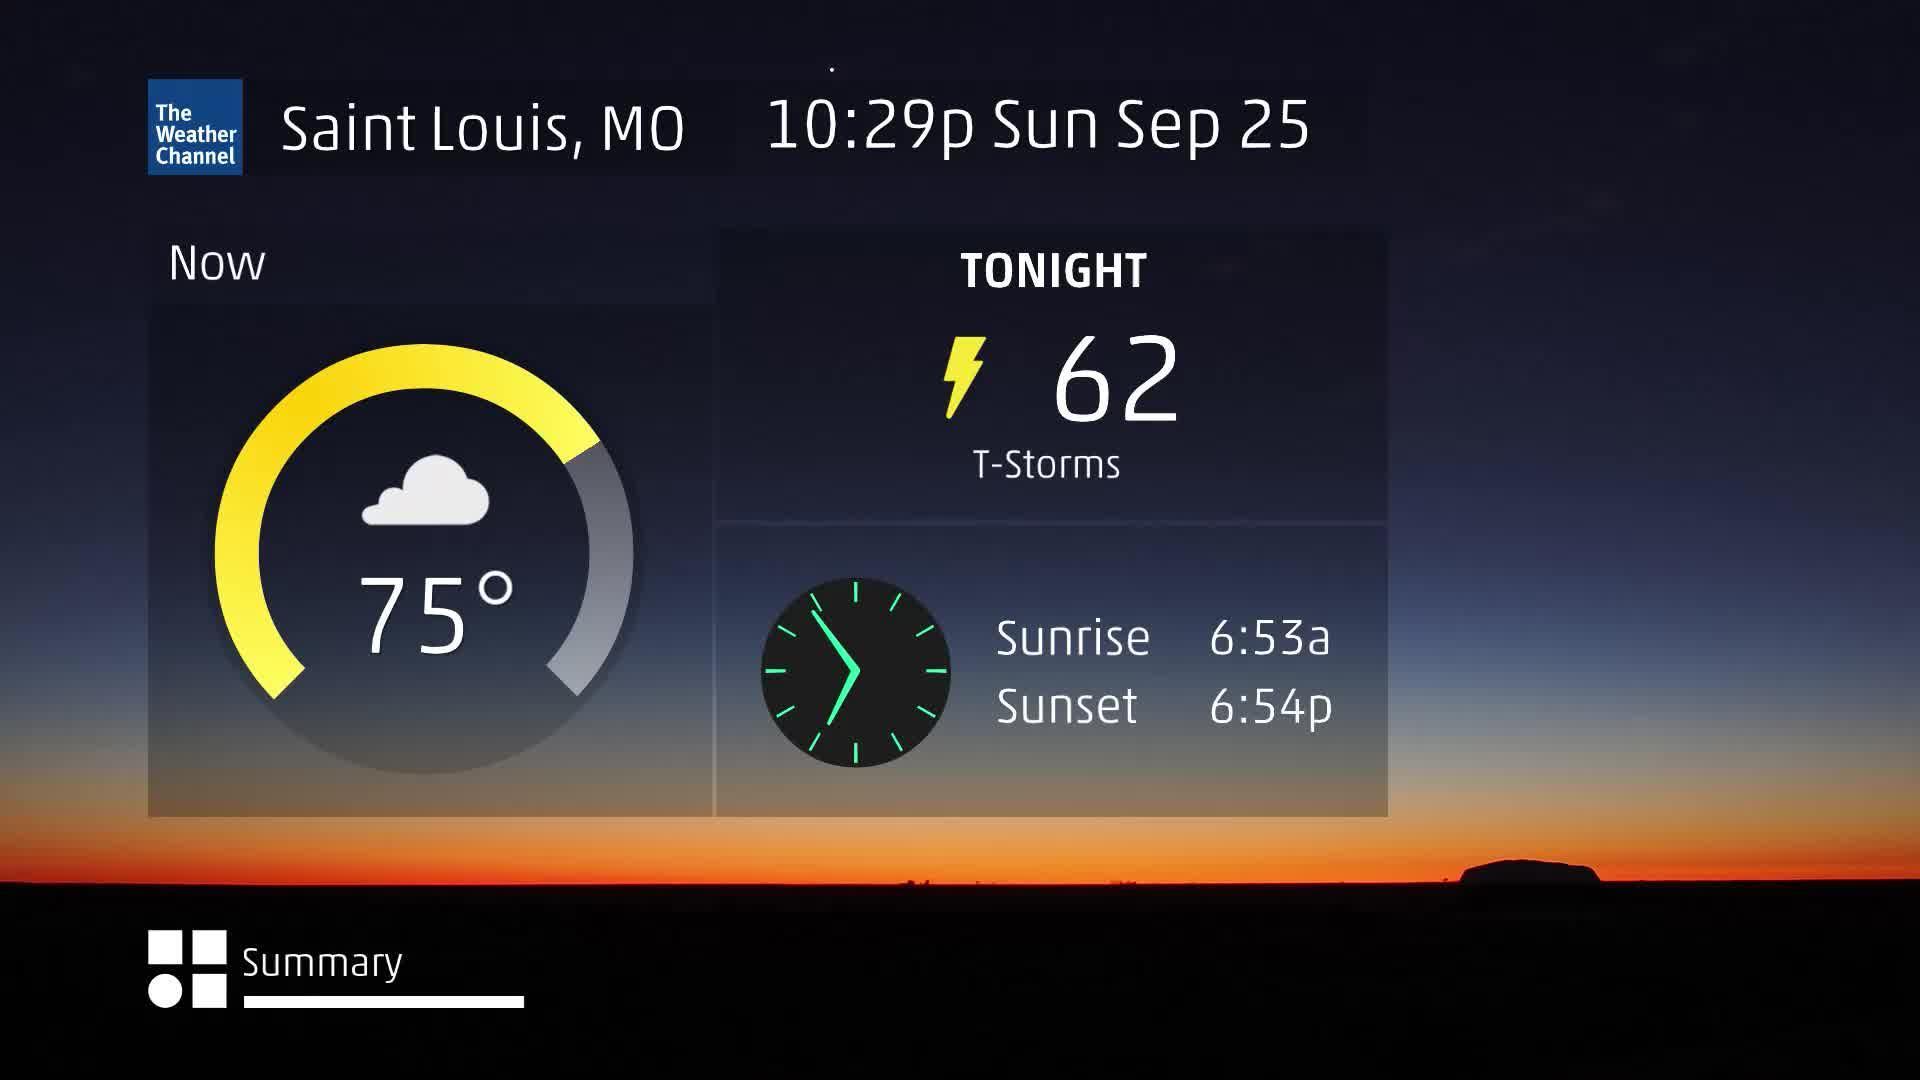 Saint Louis, MO 60 Second Forecast